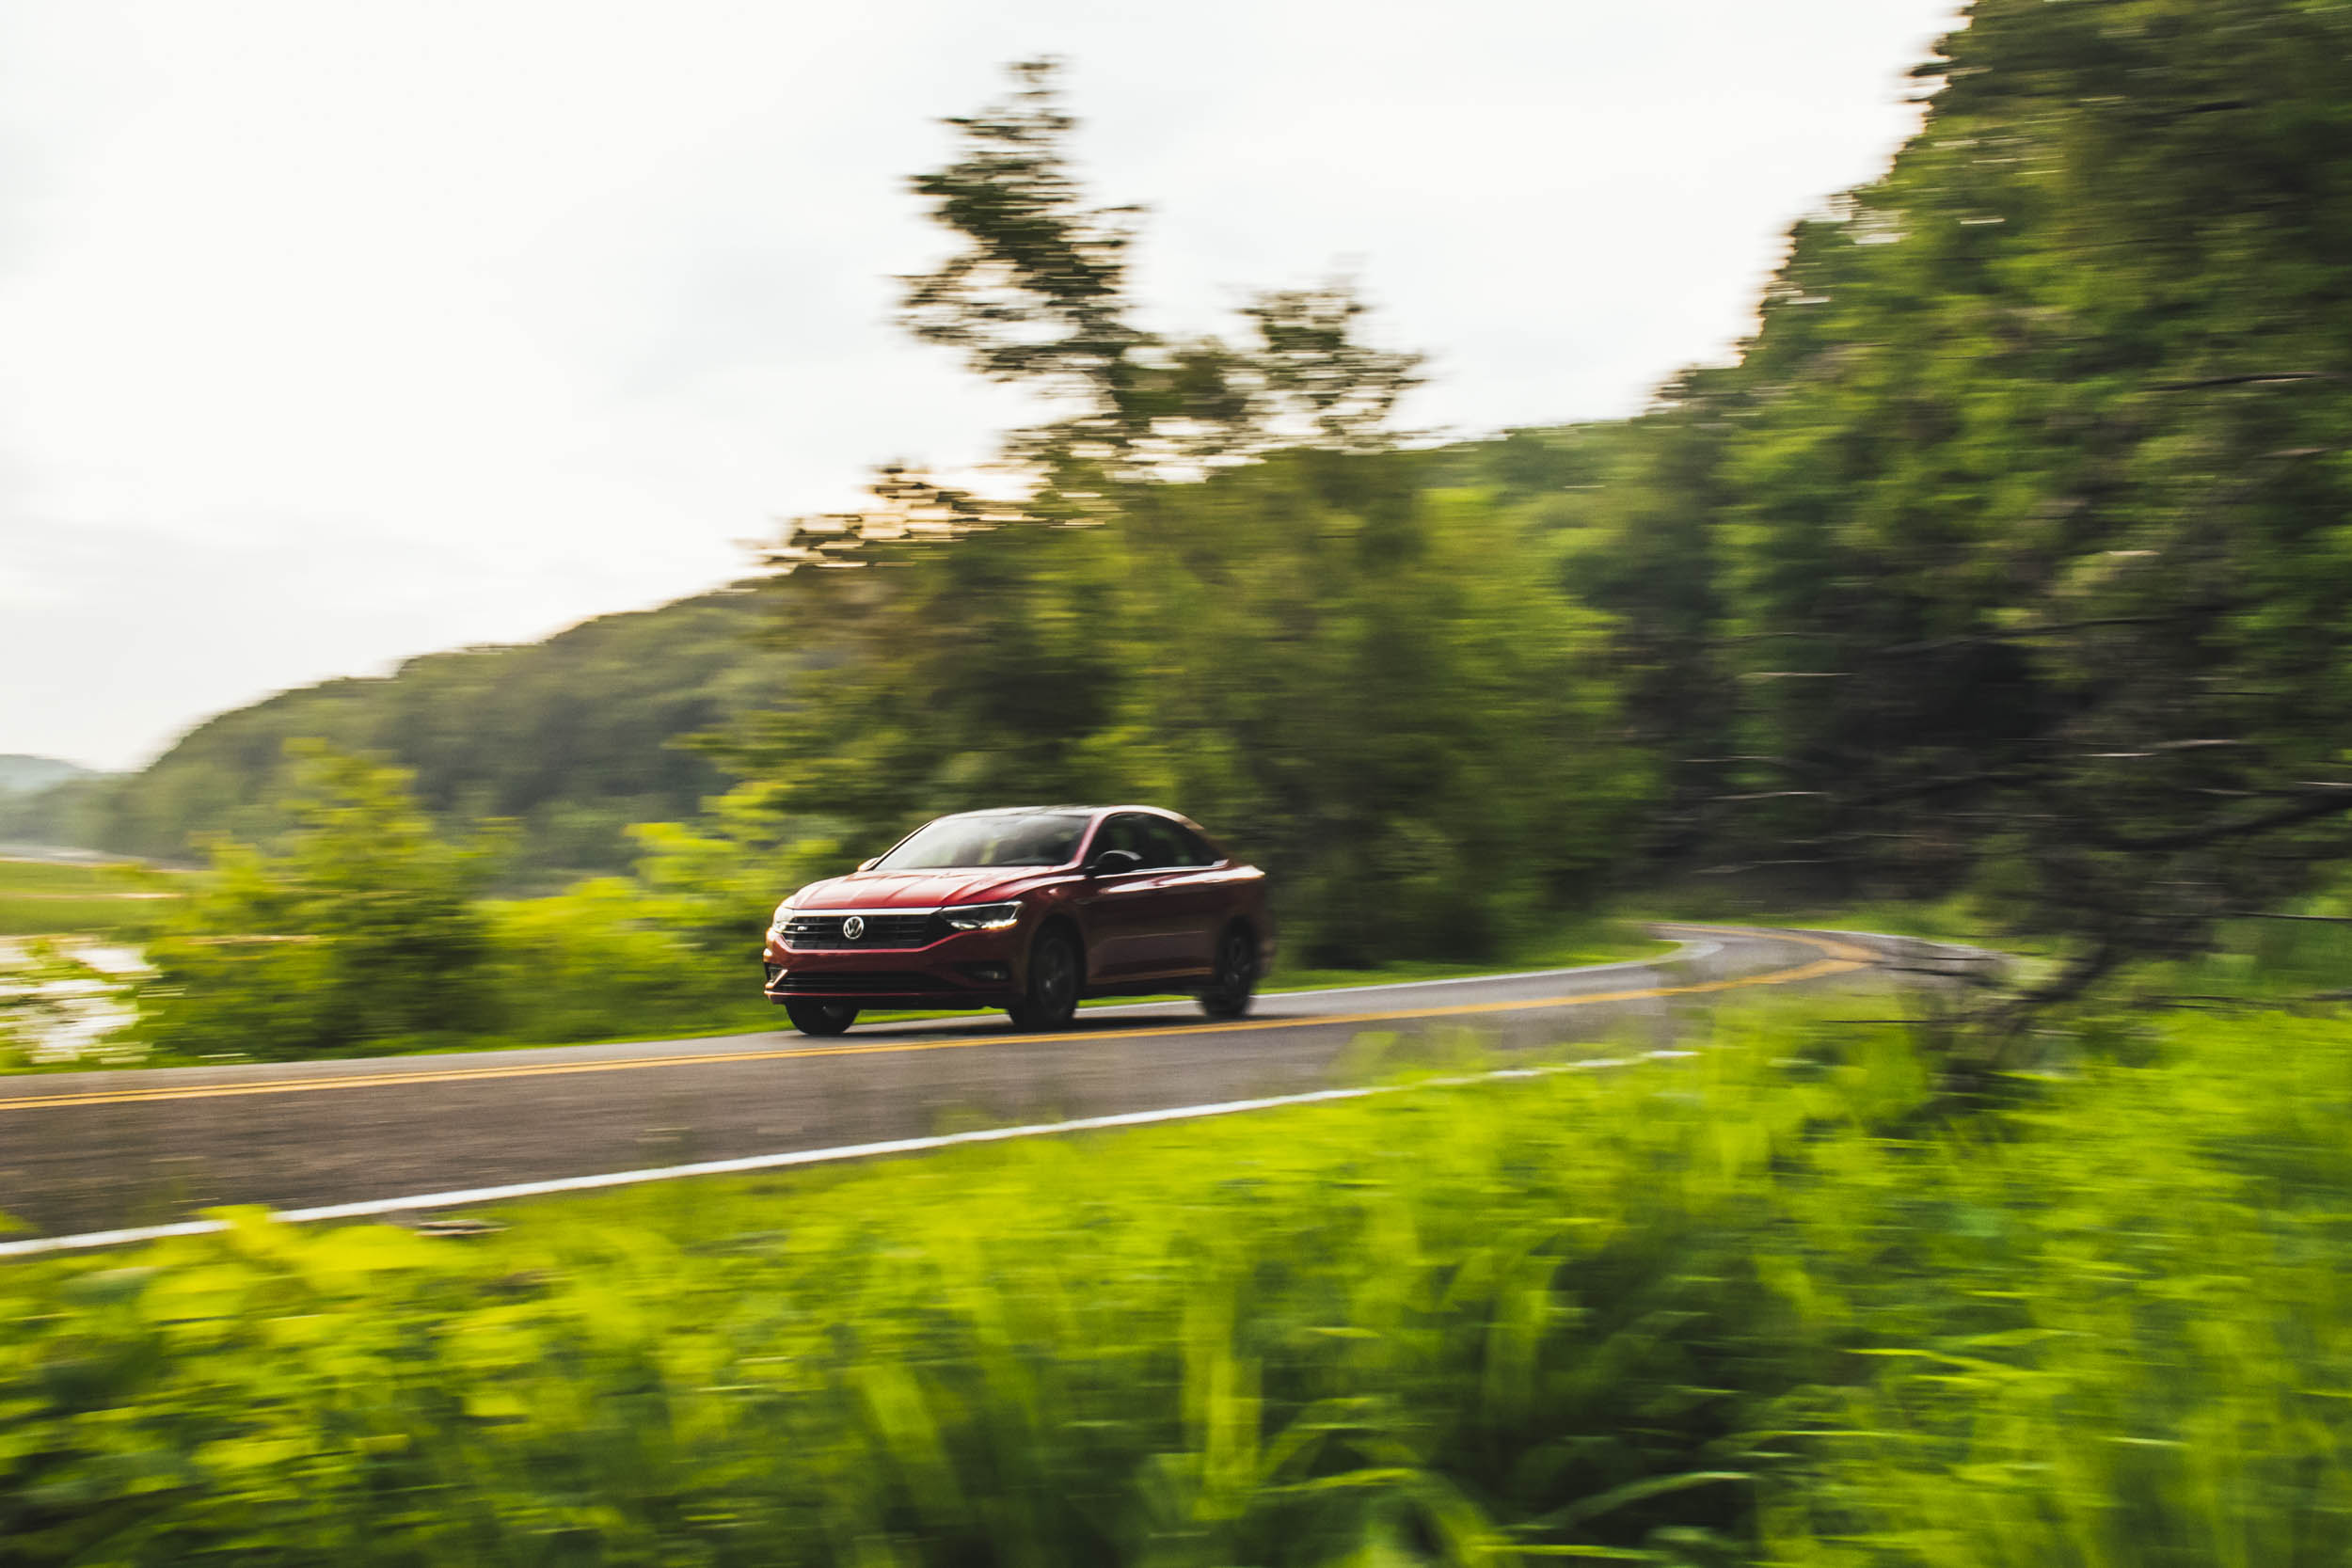 volkswagen jetta r-line driving alone on road